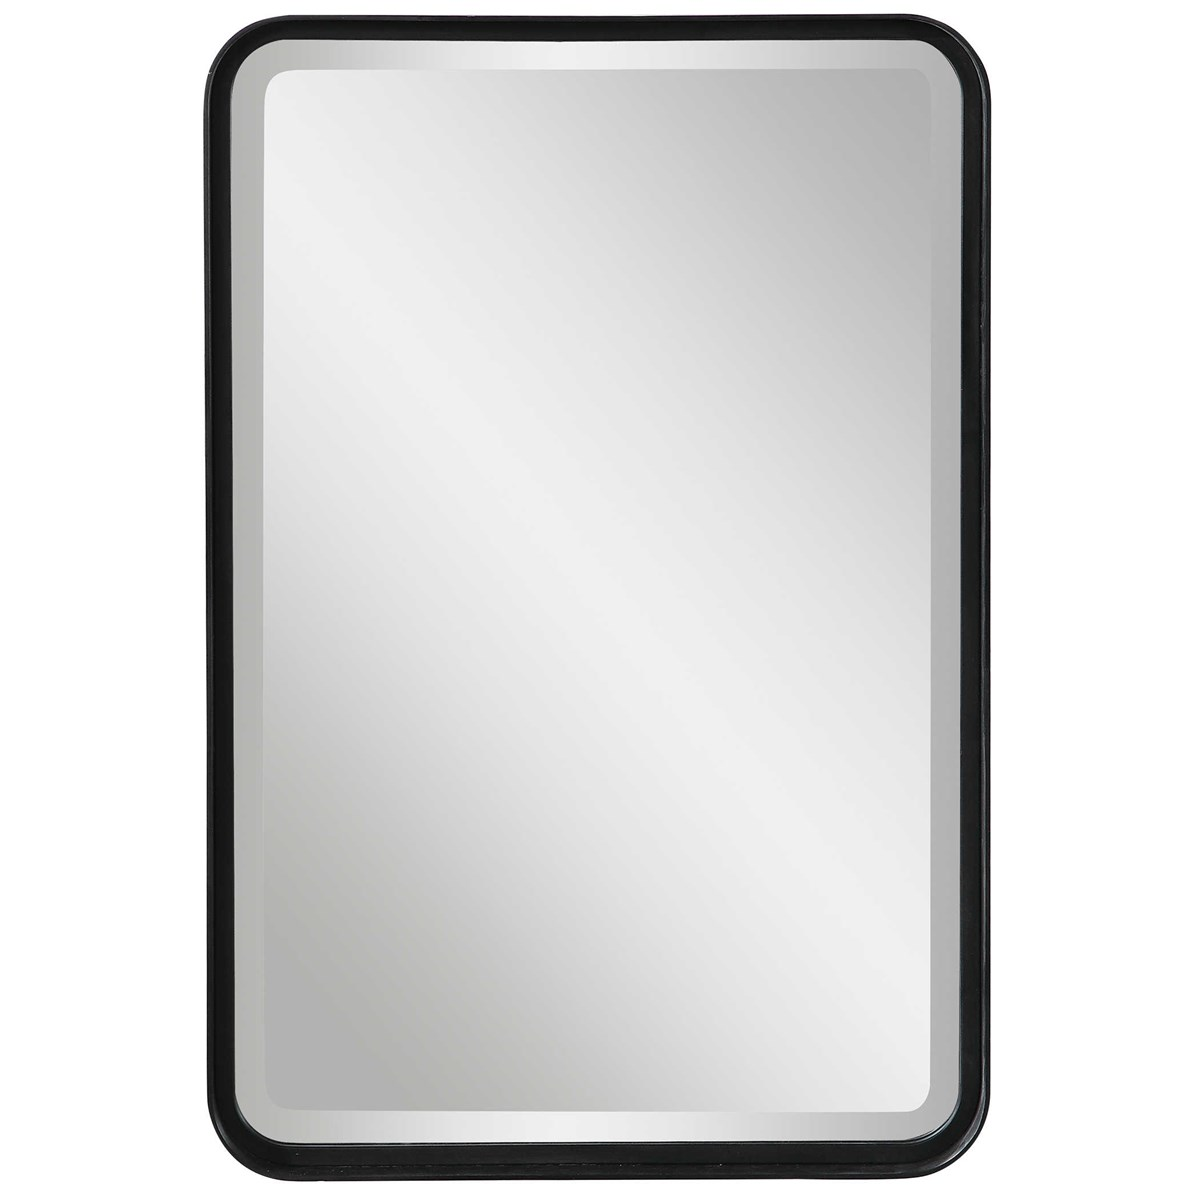 Croften Black Vanity Mirror Uttermost